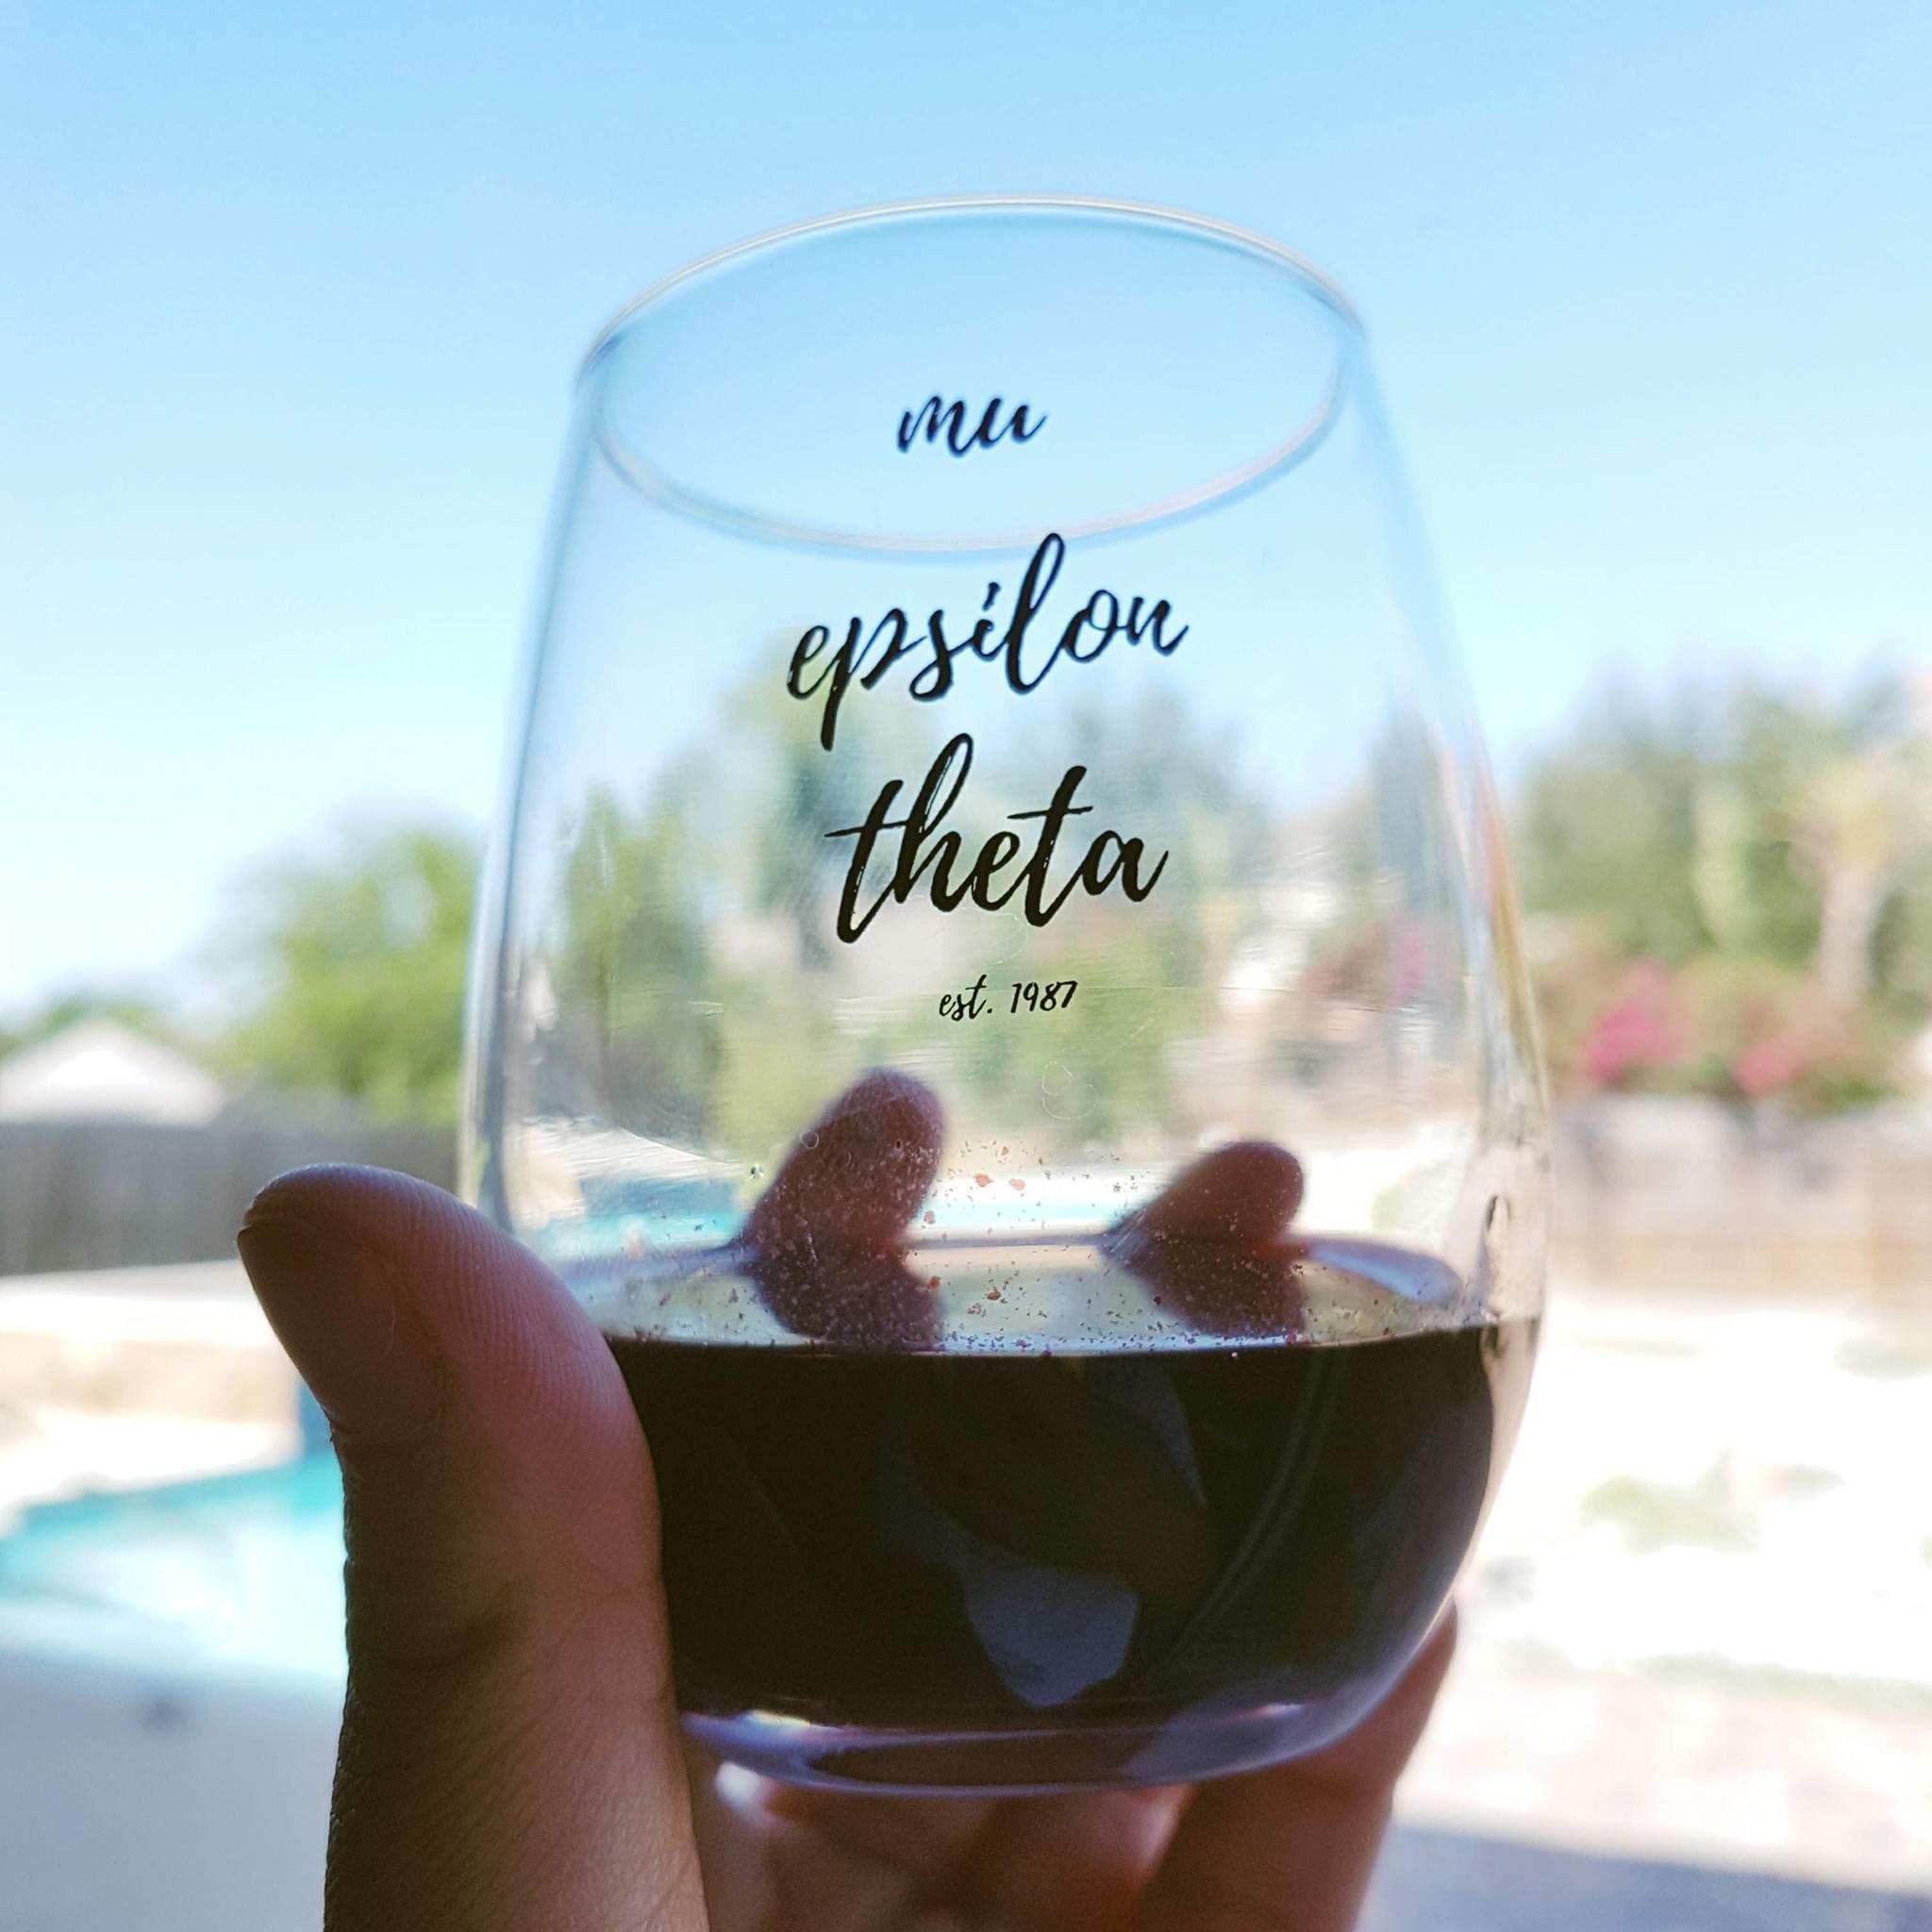 Mu Epsilon Theta Stemless Wineglass 10004